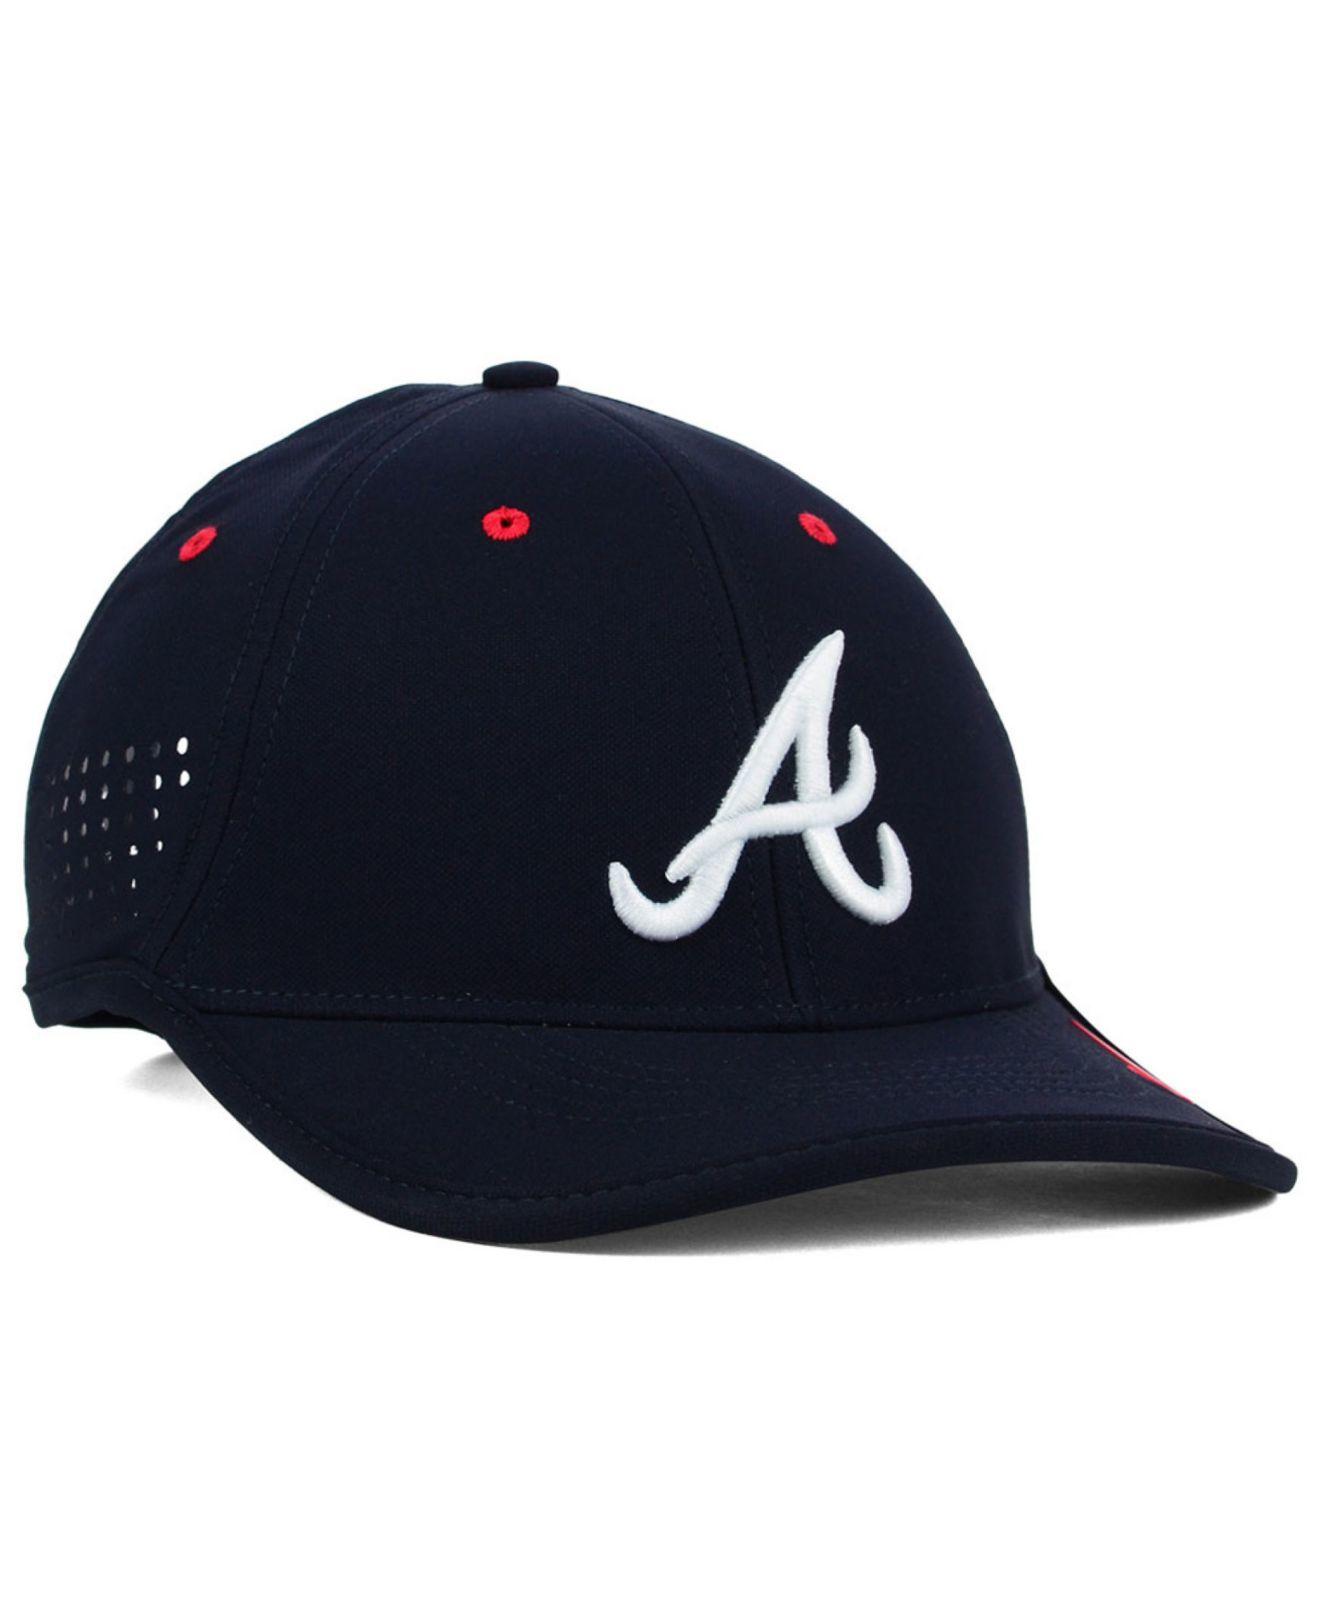 Lyst - Nike Atlanta Braves Vapor Swoosh Adjustable Cap in Blue for Men 4593b57c72c